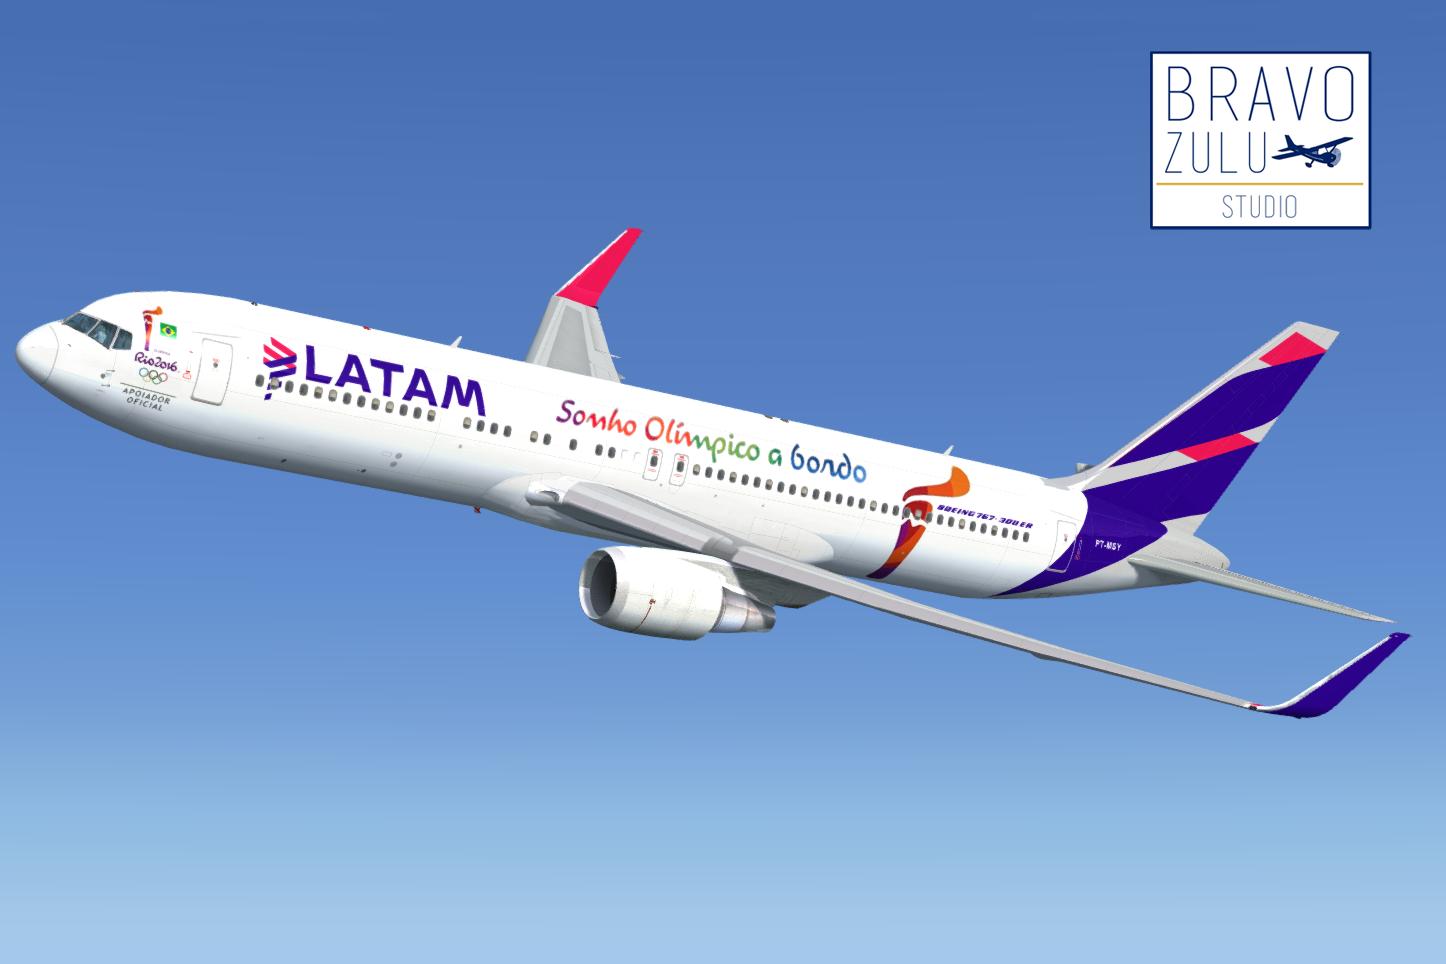 Boeing 767-300ER LATAM Brasil + Chile + Argentina + RIO 2016 | Bravo